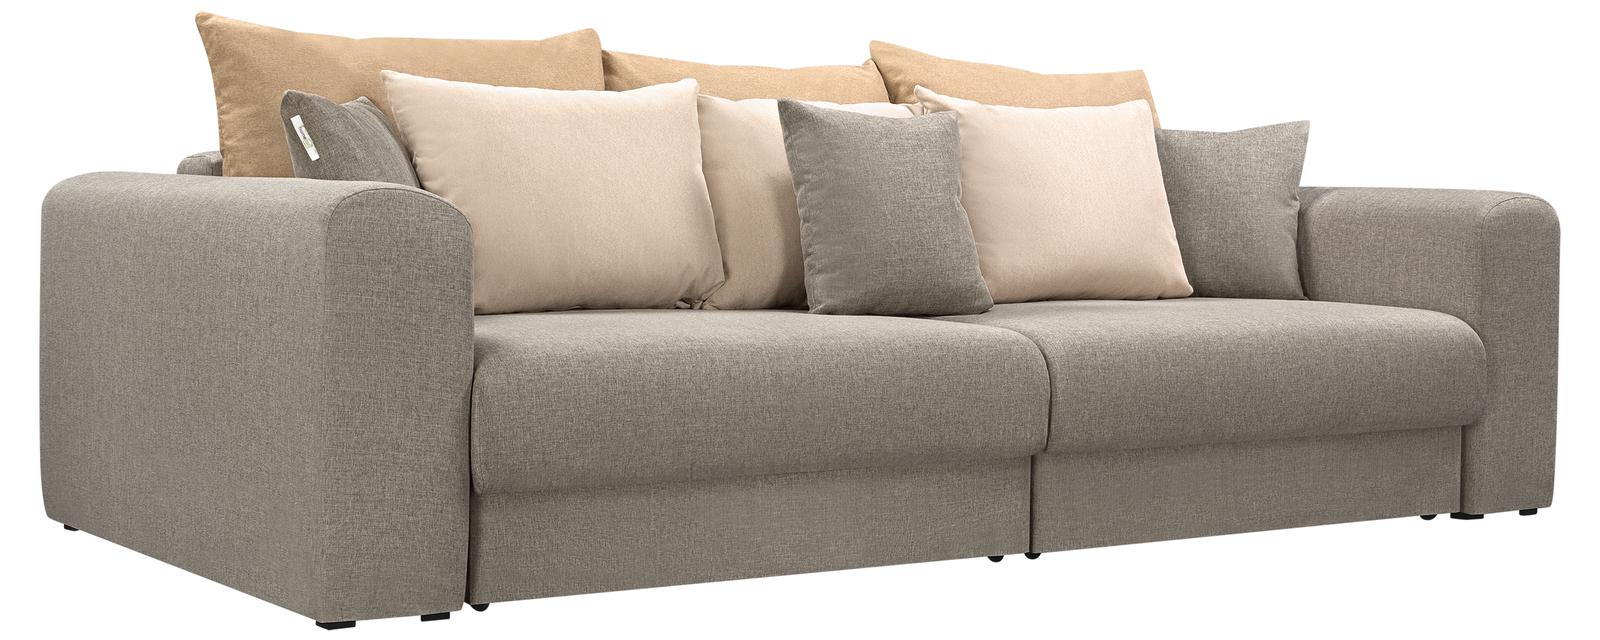 Модульный диван Медисон Вариант №4 Kiton серый (Рогожка)